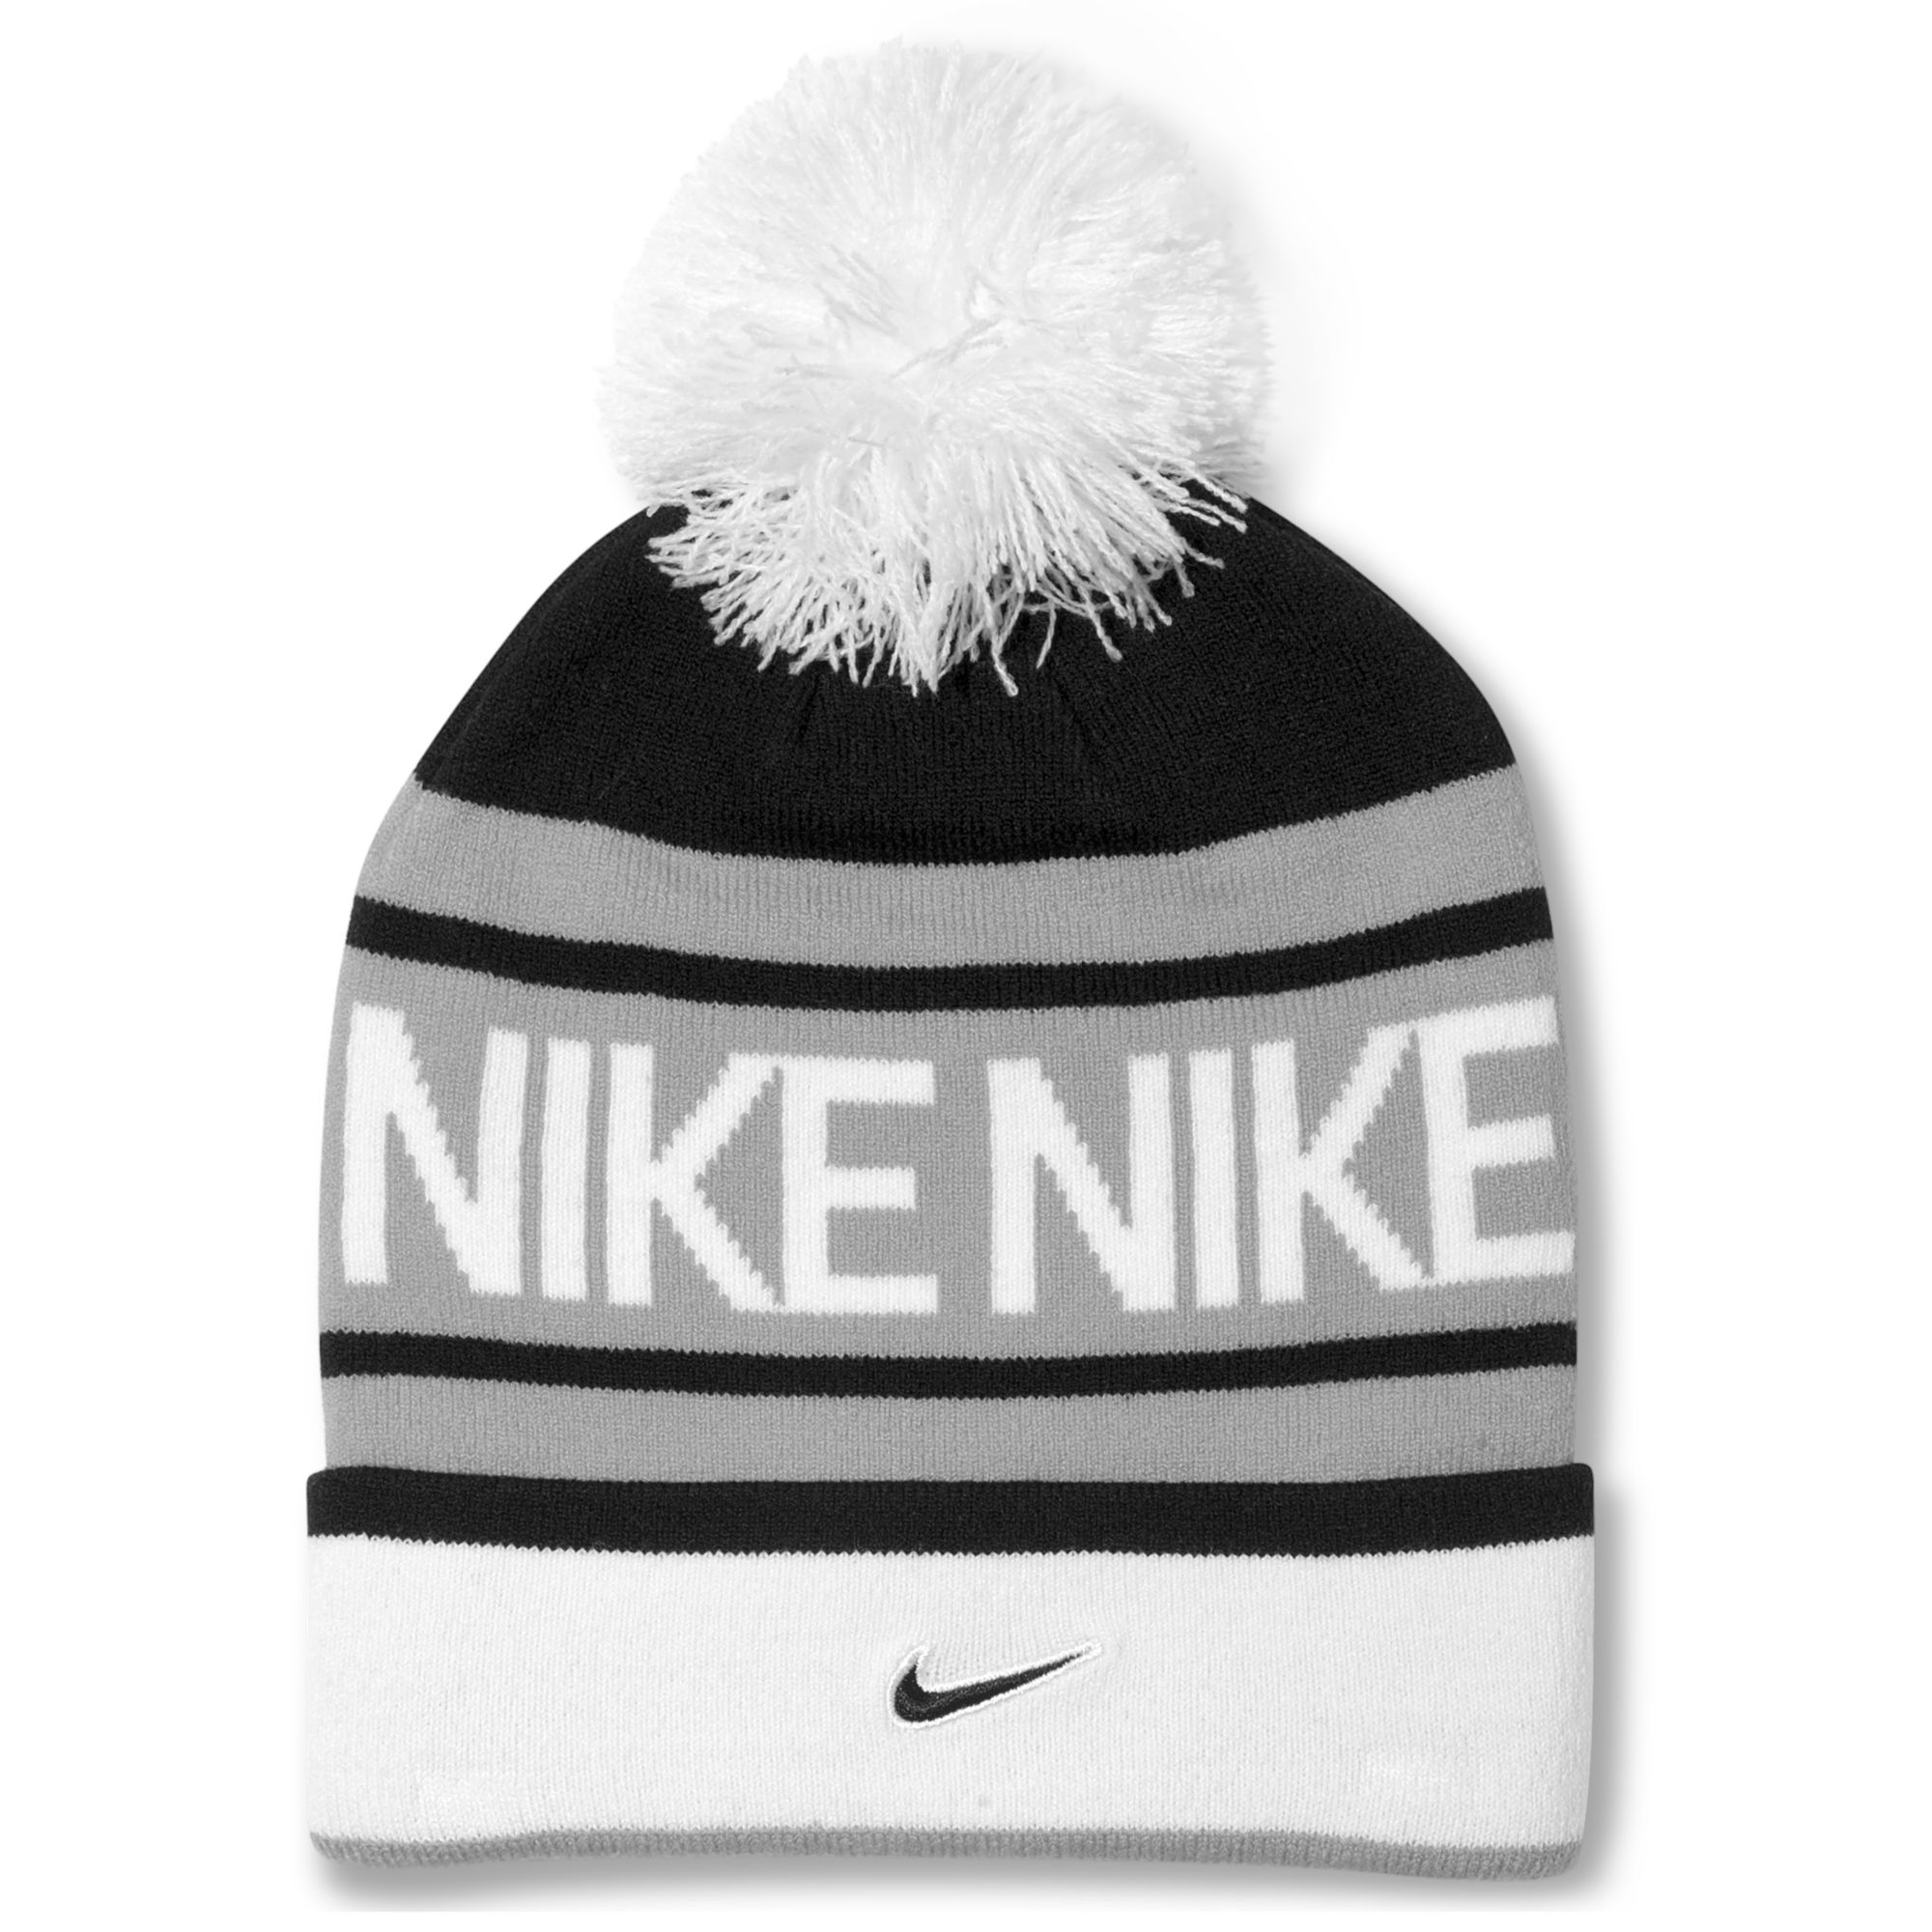 8702da995c2 Nike Beanie Pom Hat - Hat HD Image Ukjugs.Org